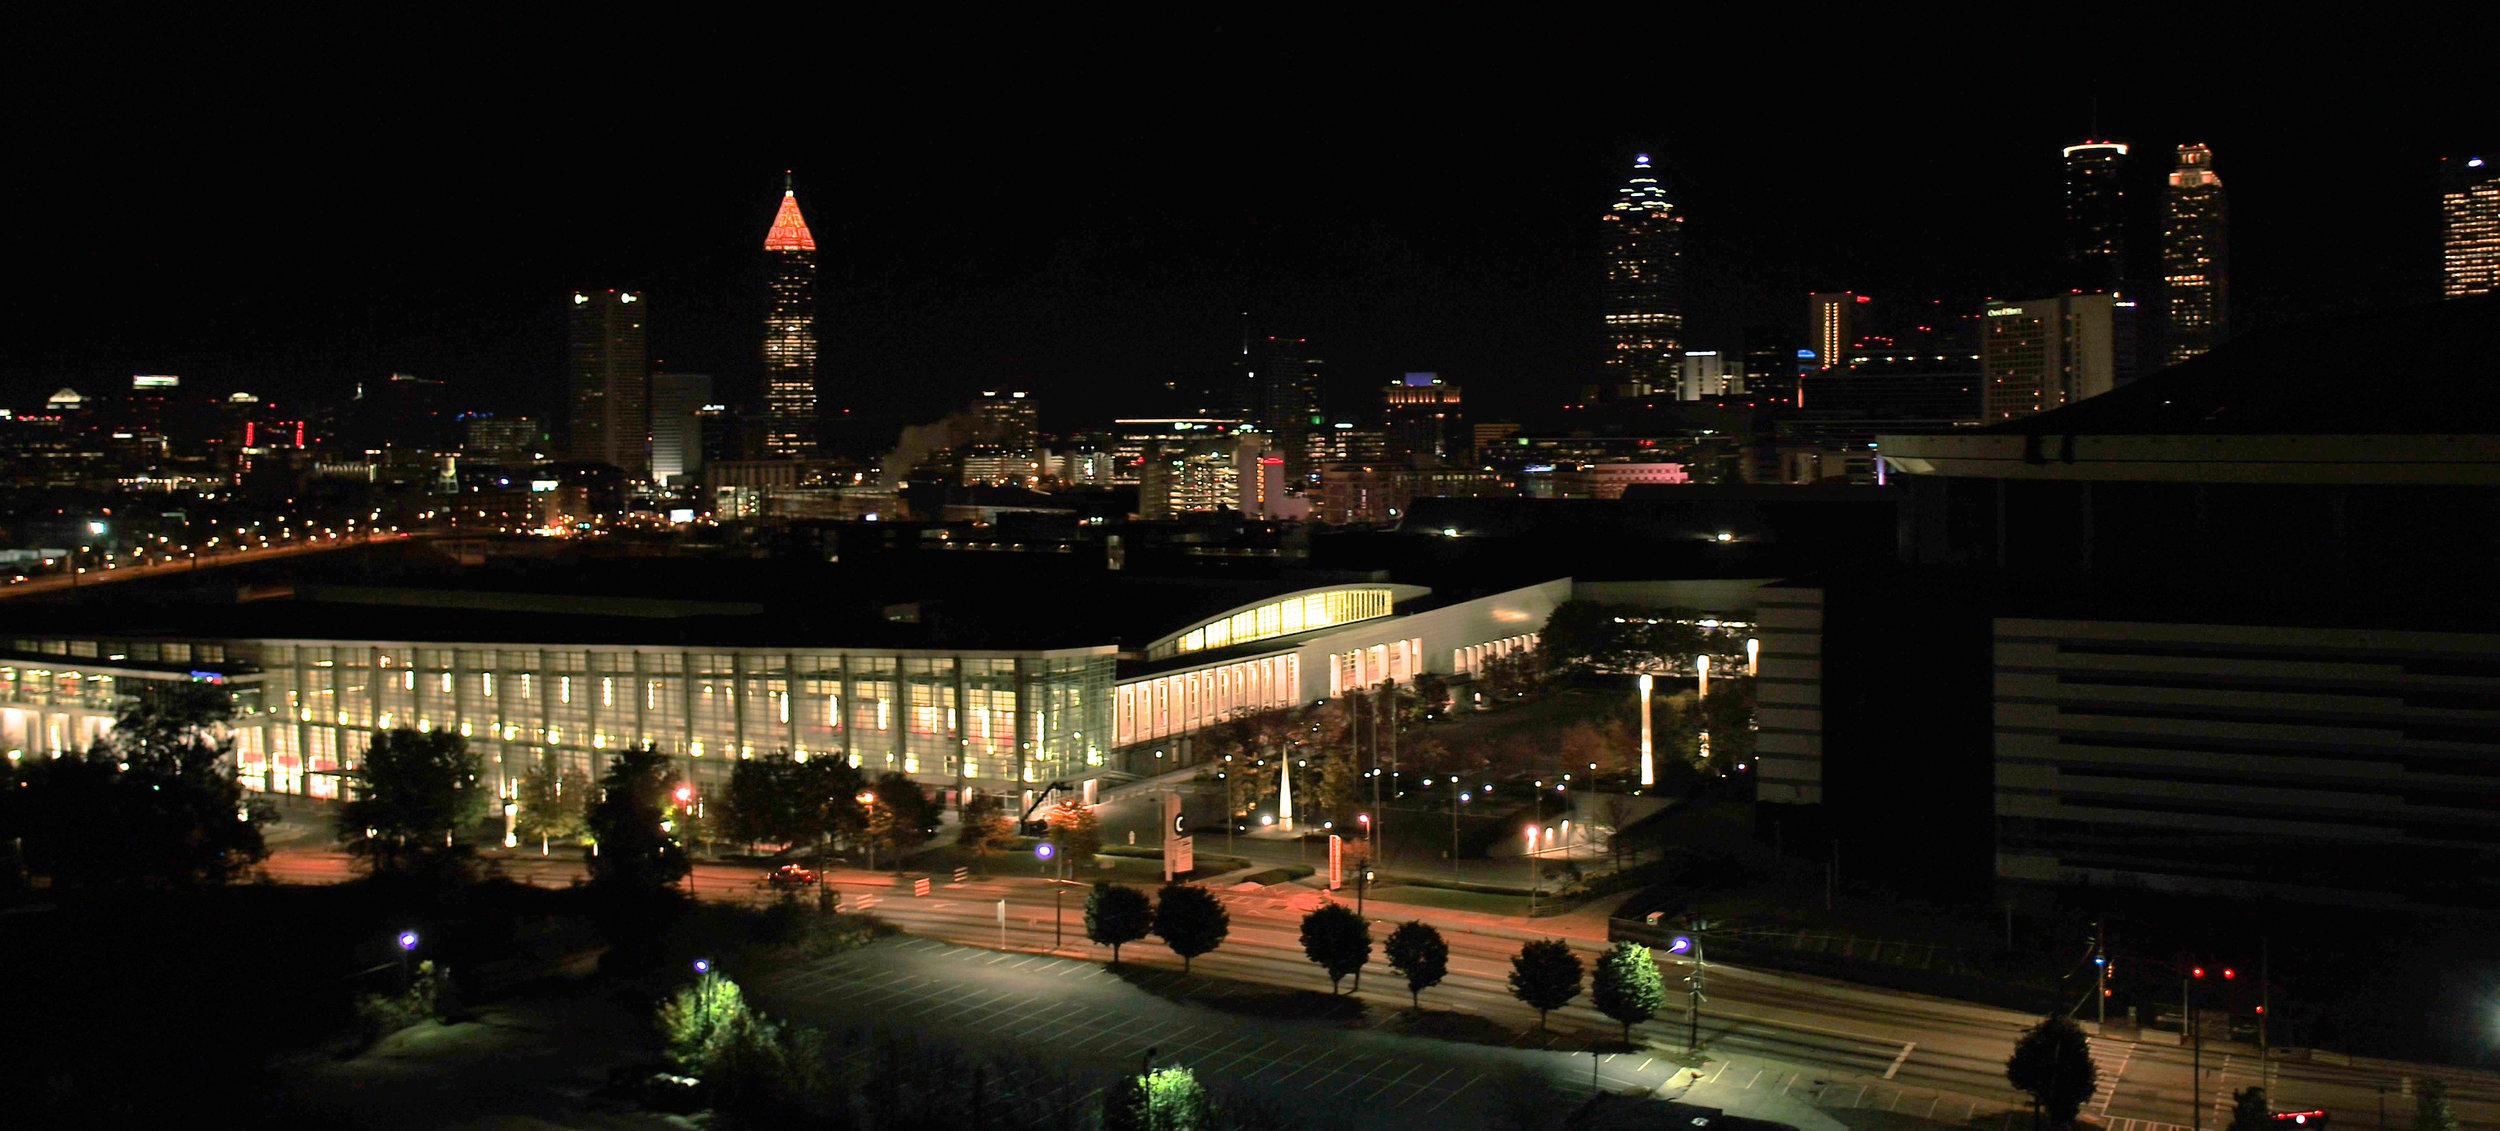 Atlanta_GA Dome Night copy.jpg